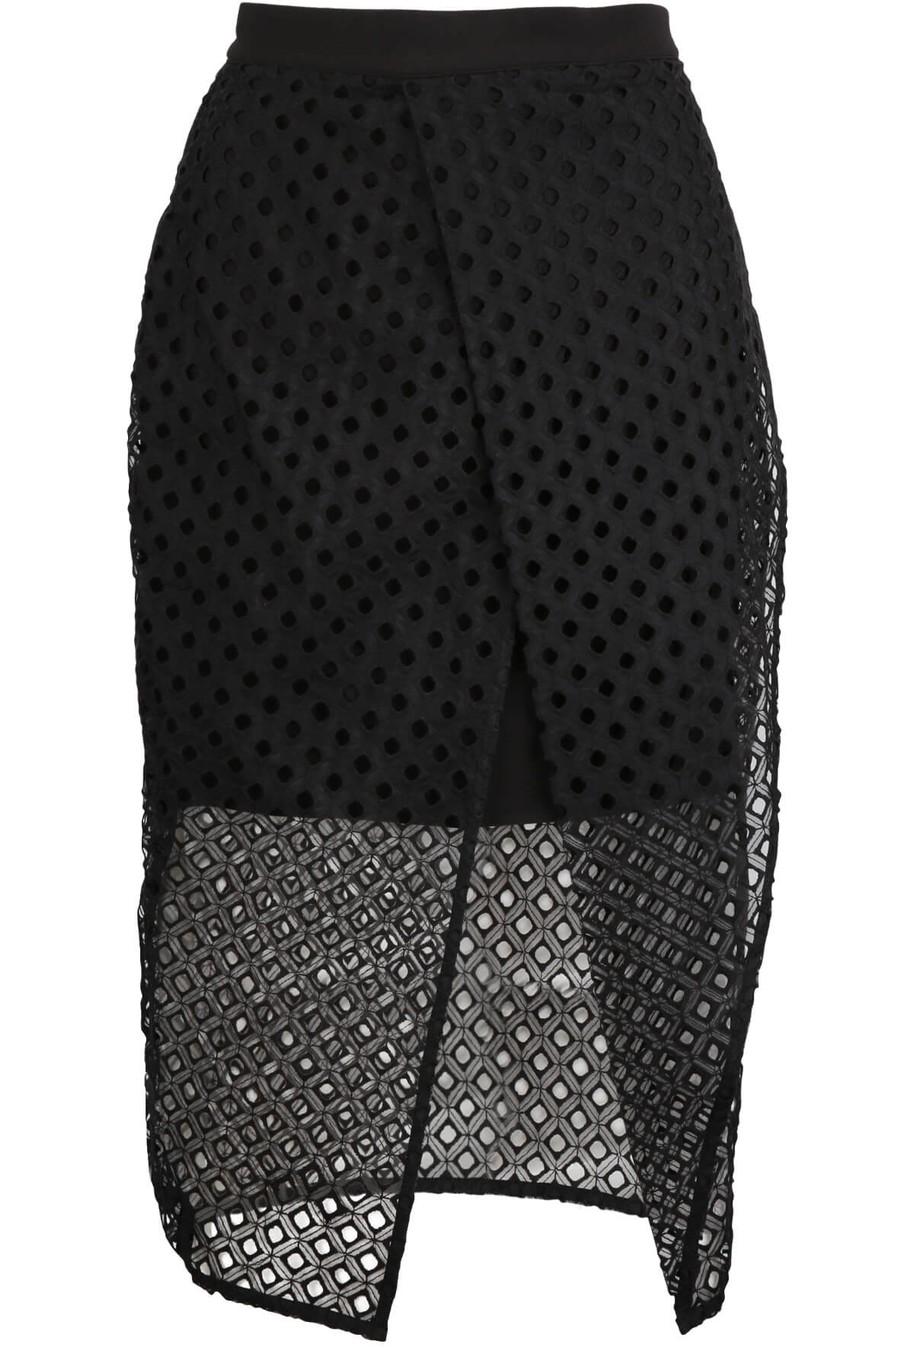 keepsake-last-dance-skirt-black-1